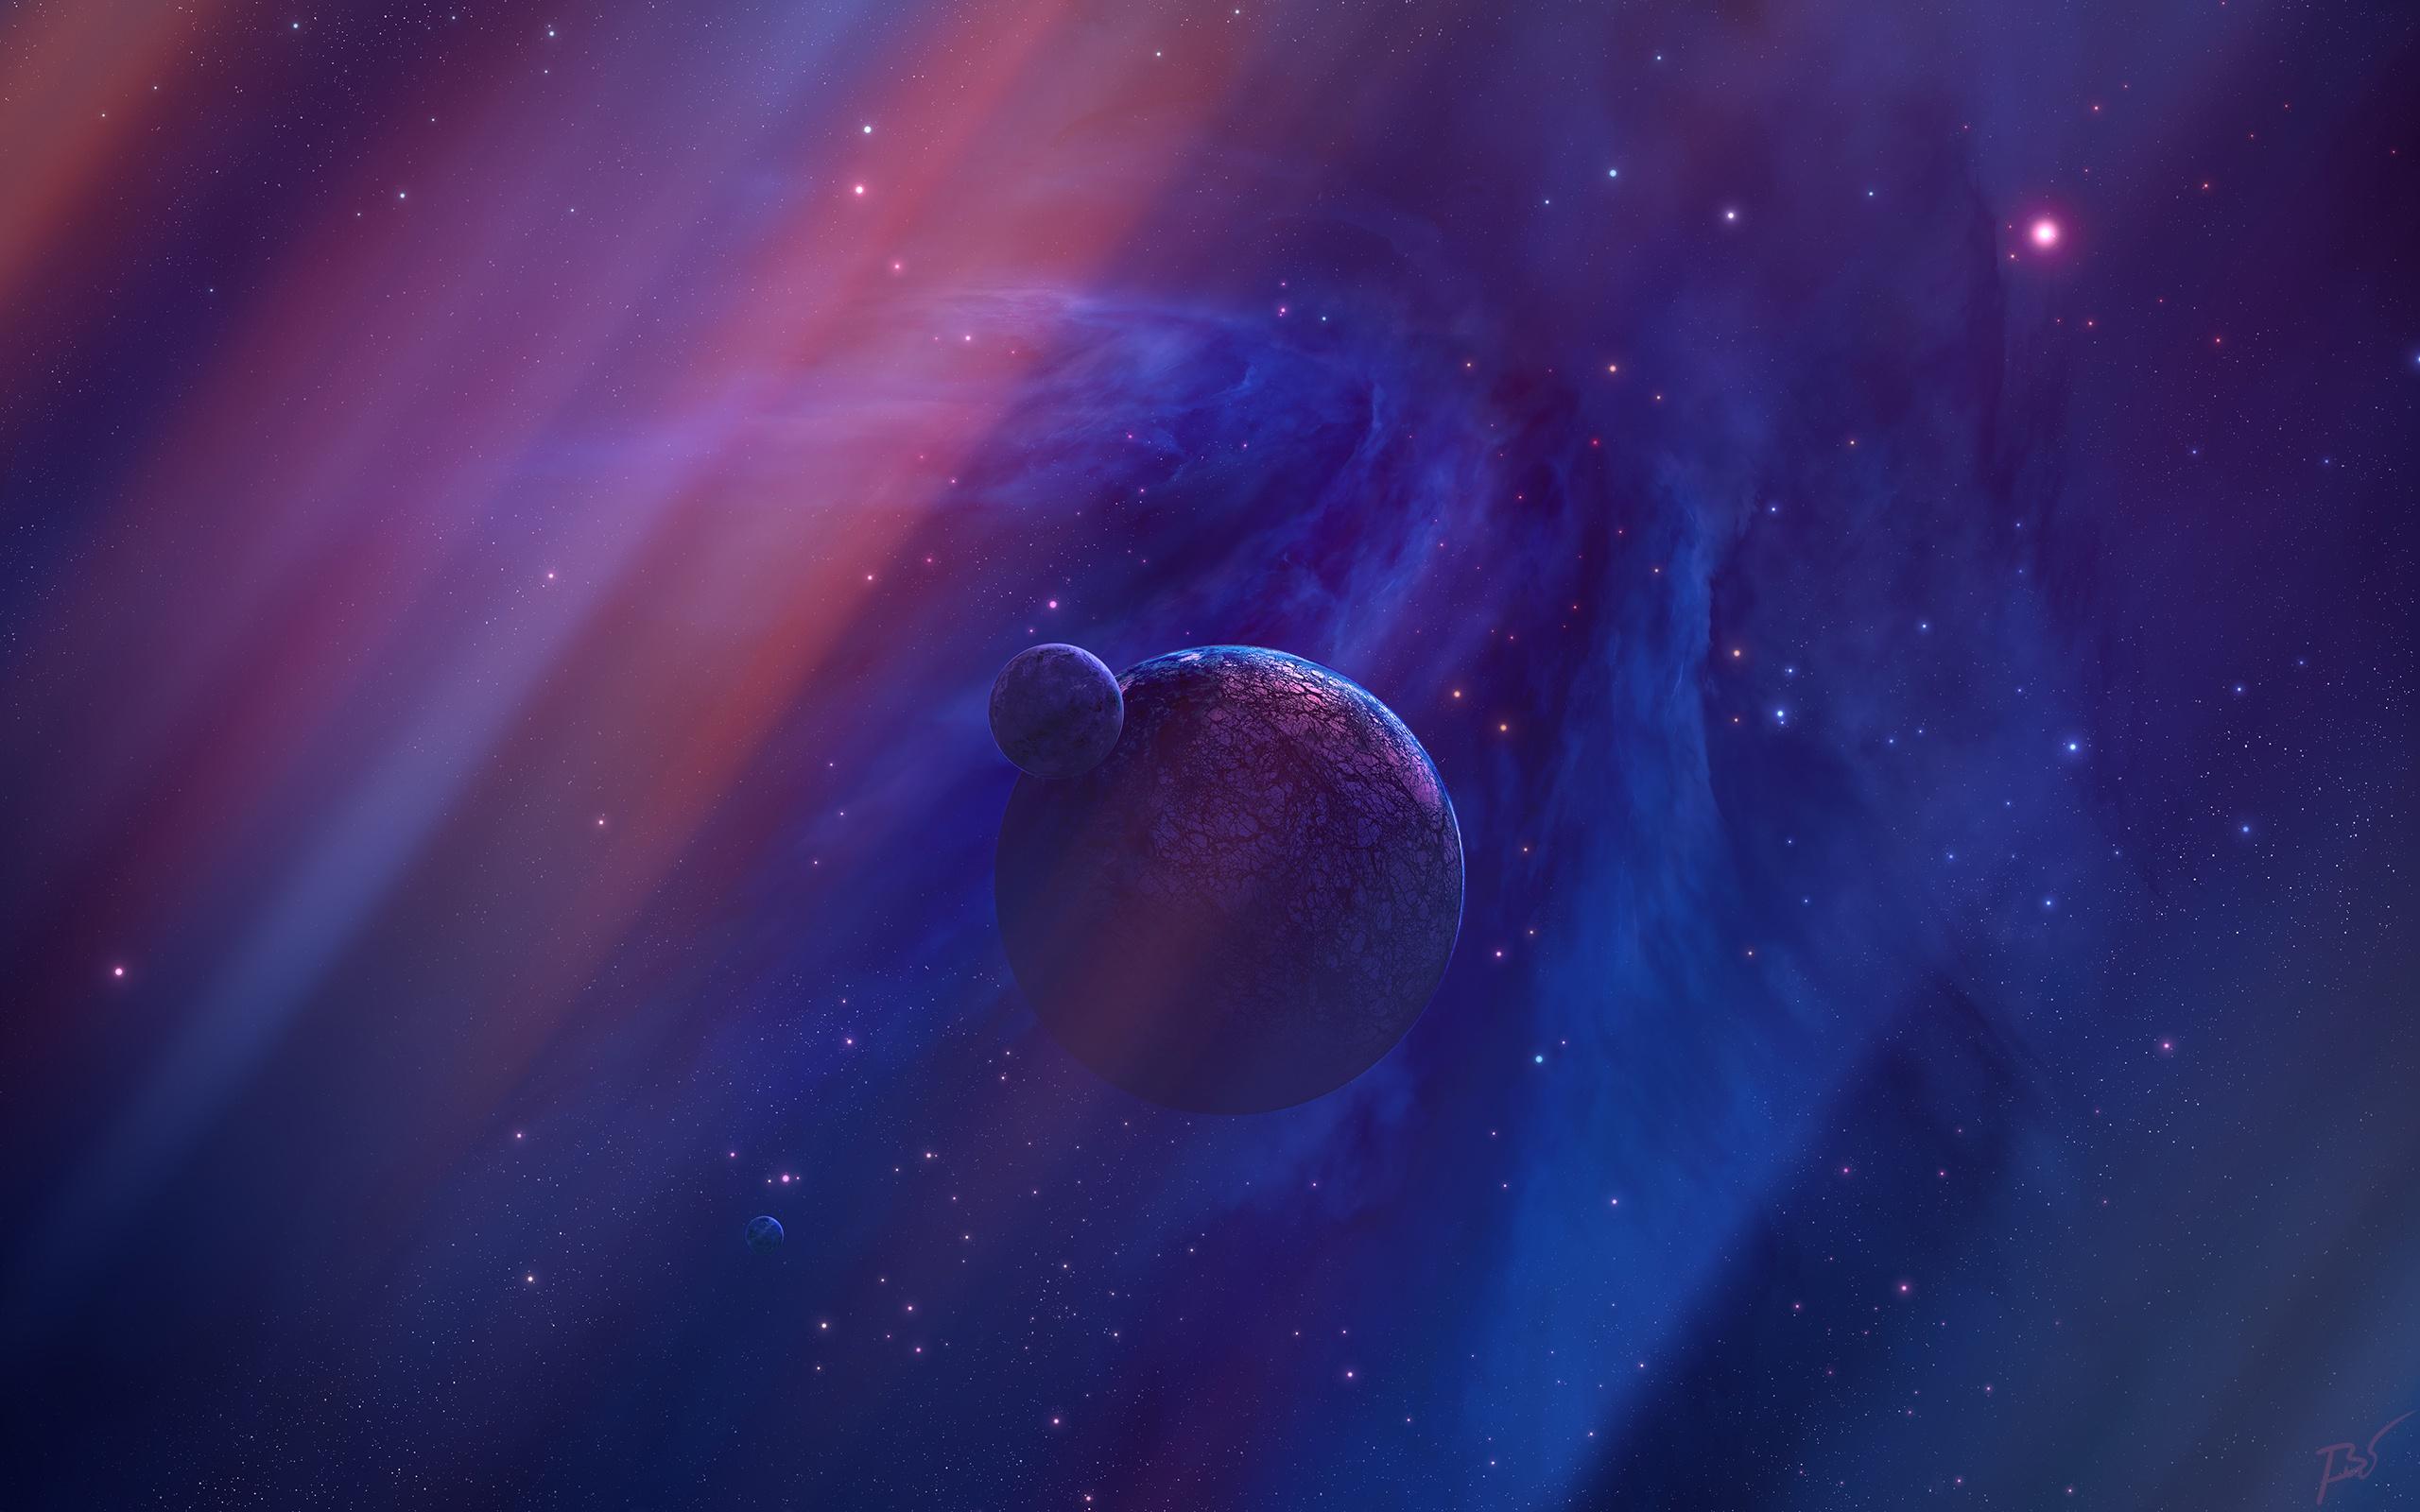 General 2560x1600 space space art planet digital art JoeyJazz